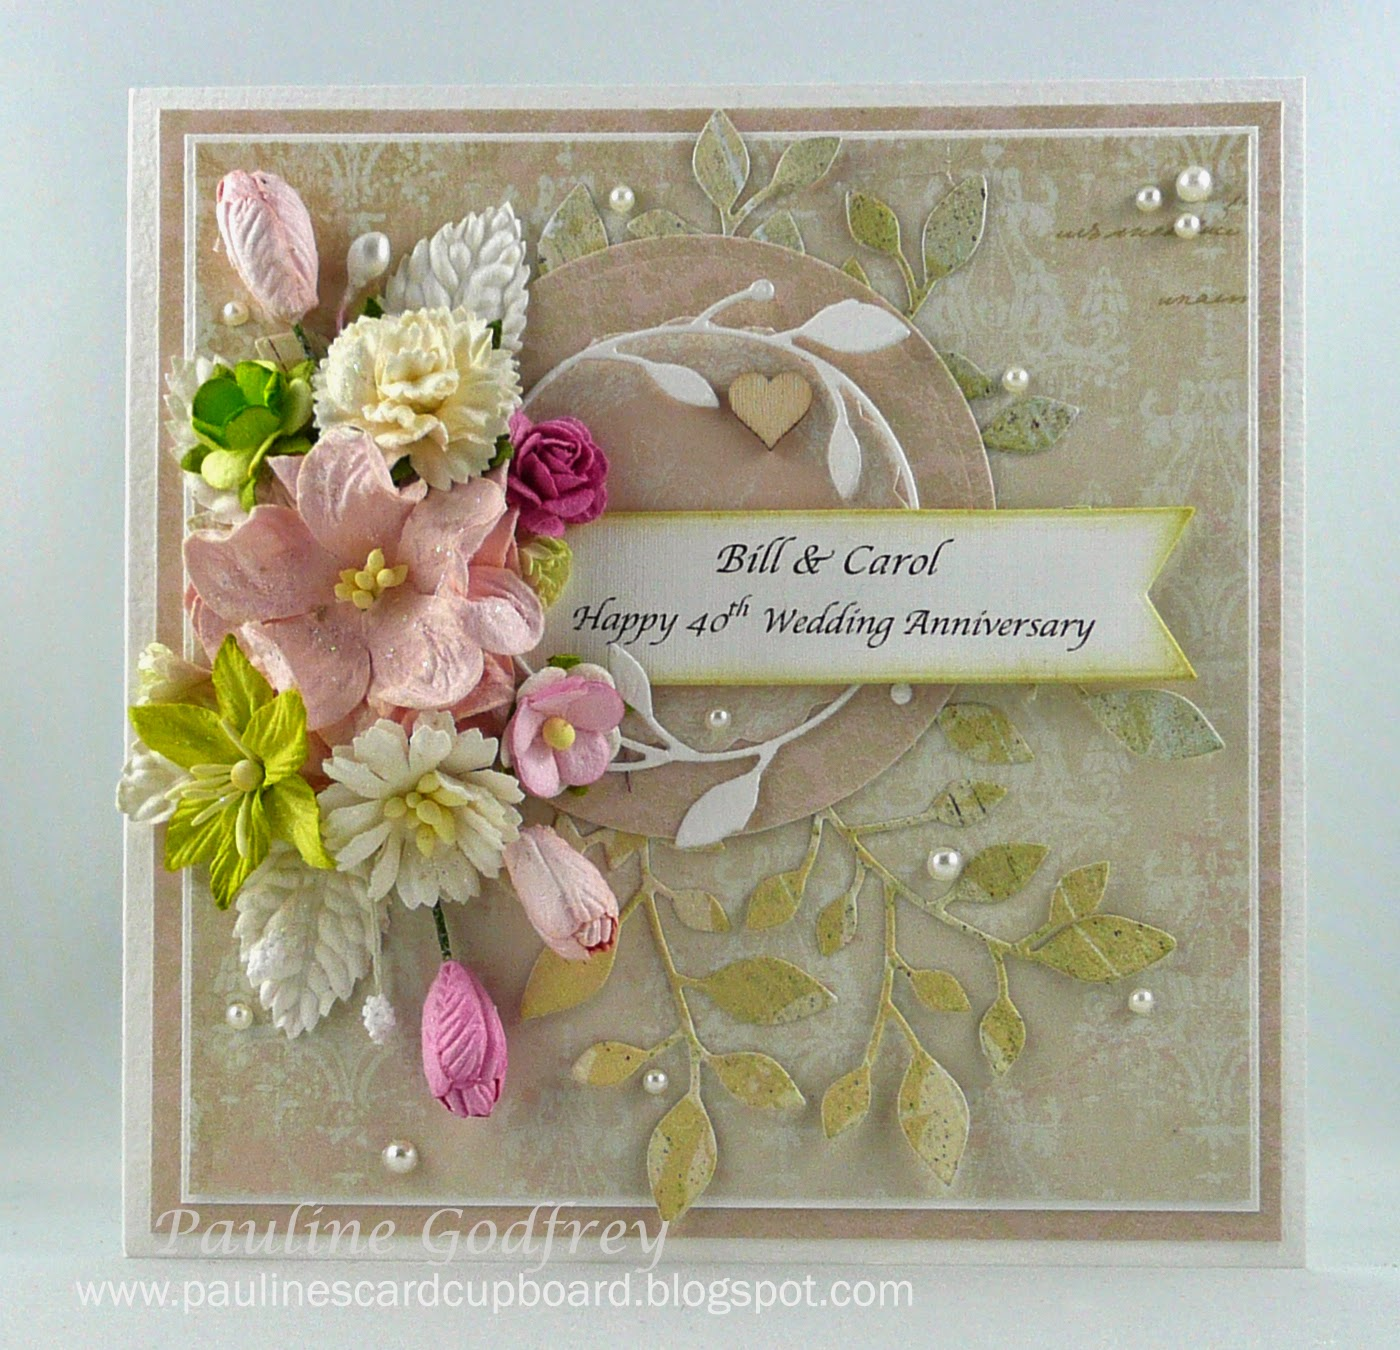 Paulines Card Cupboard 40th Wedding Anniversary